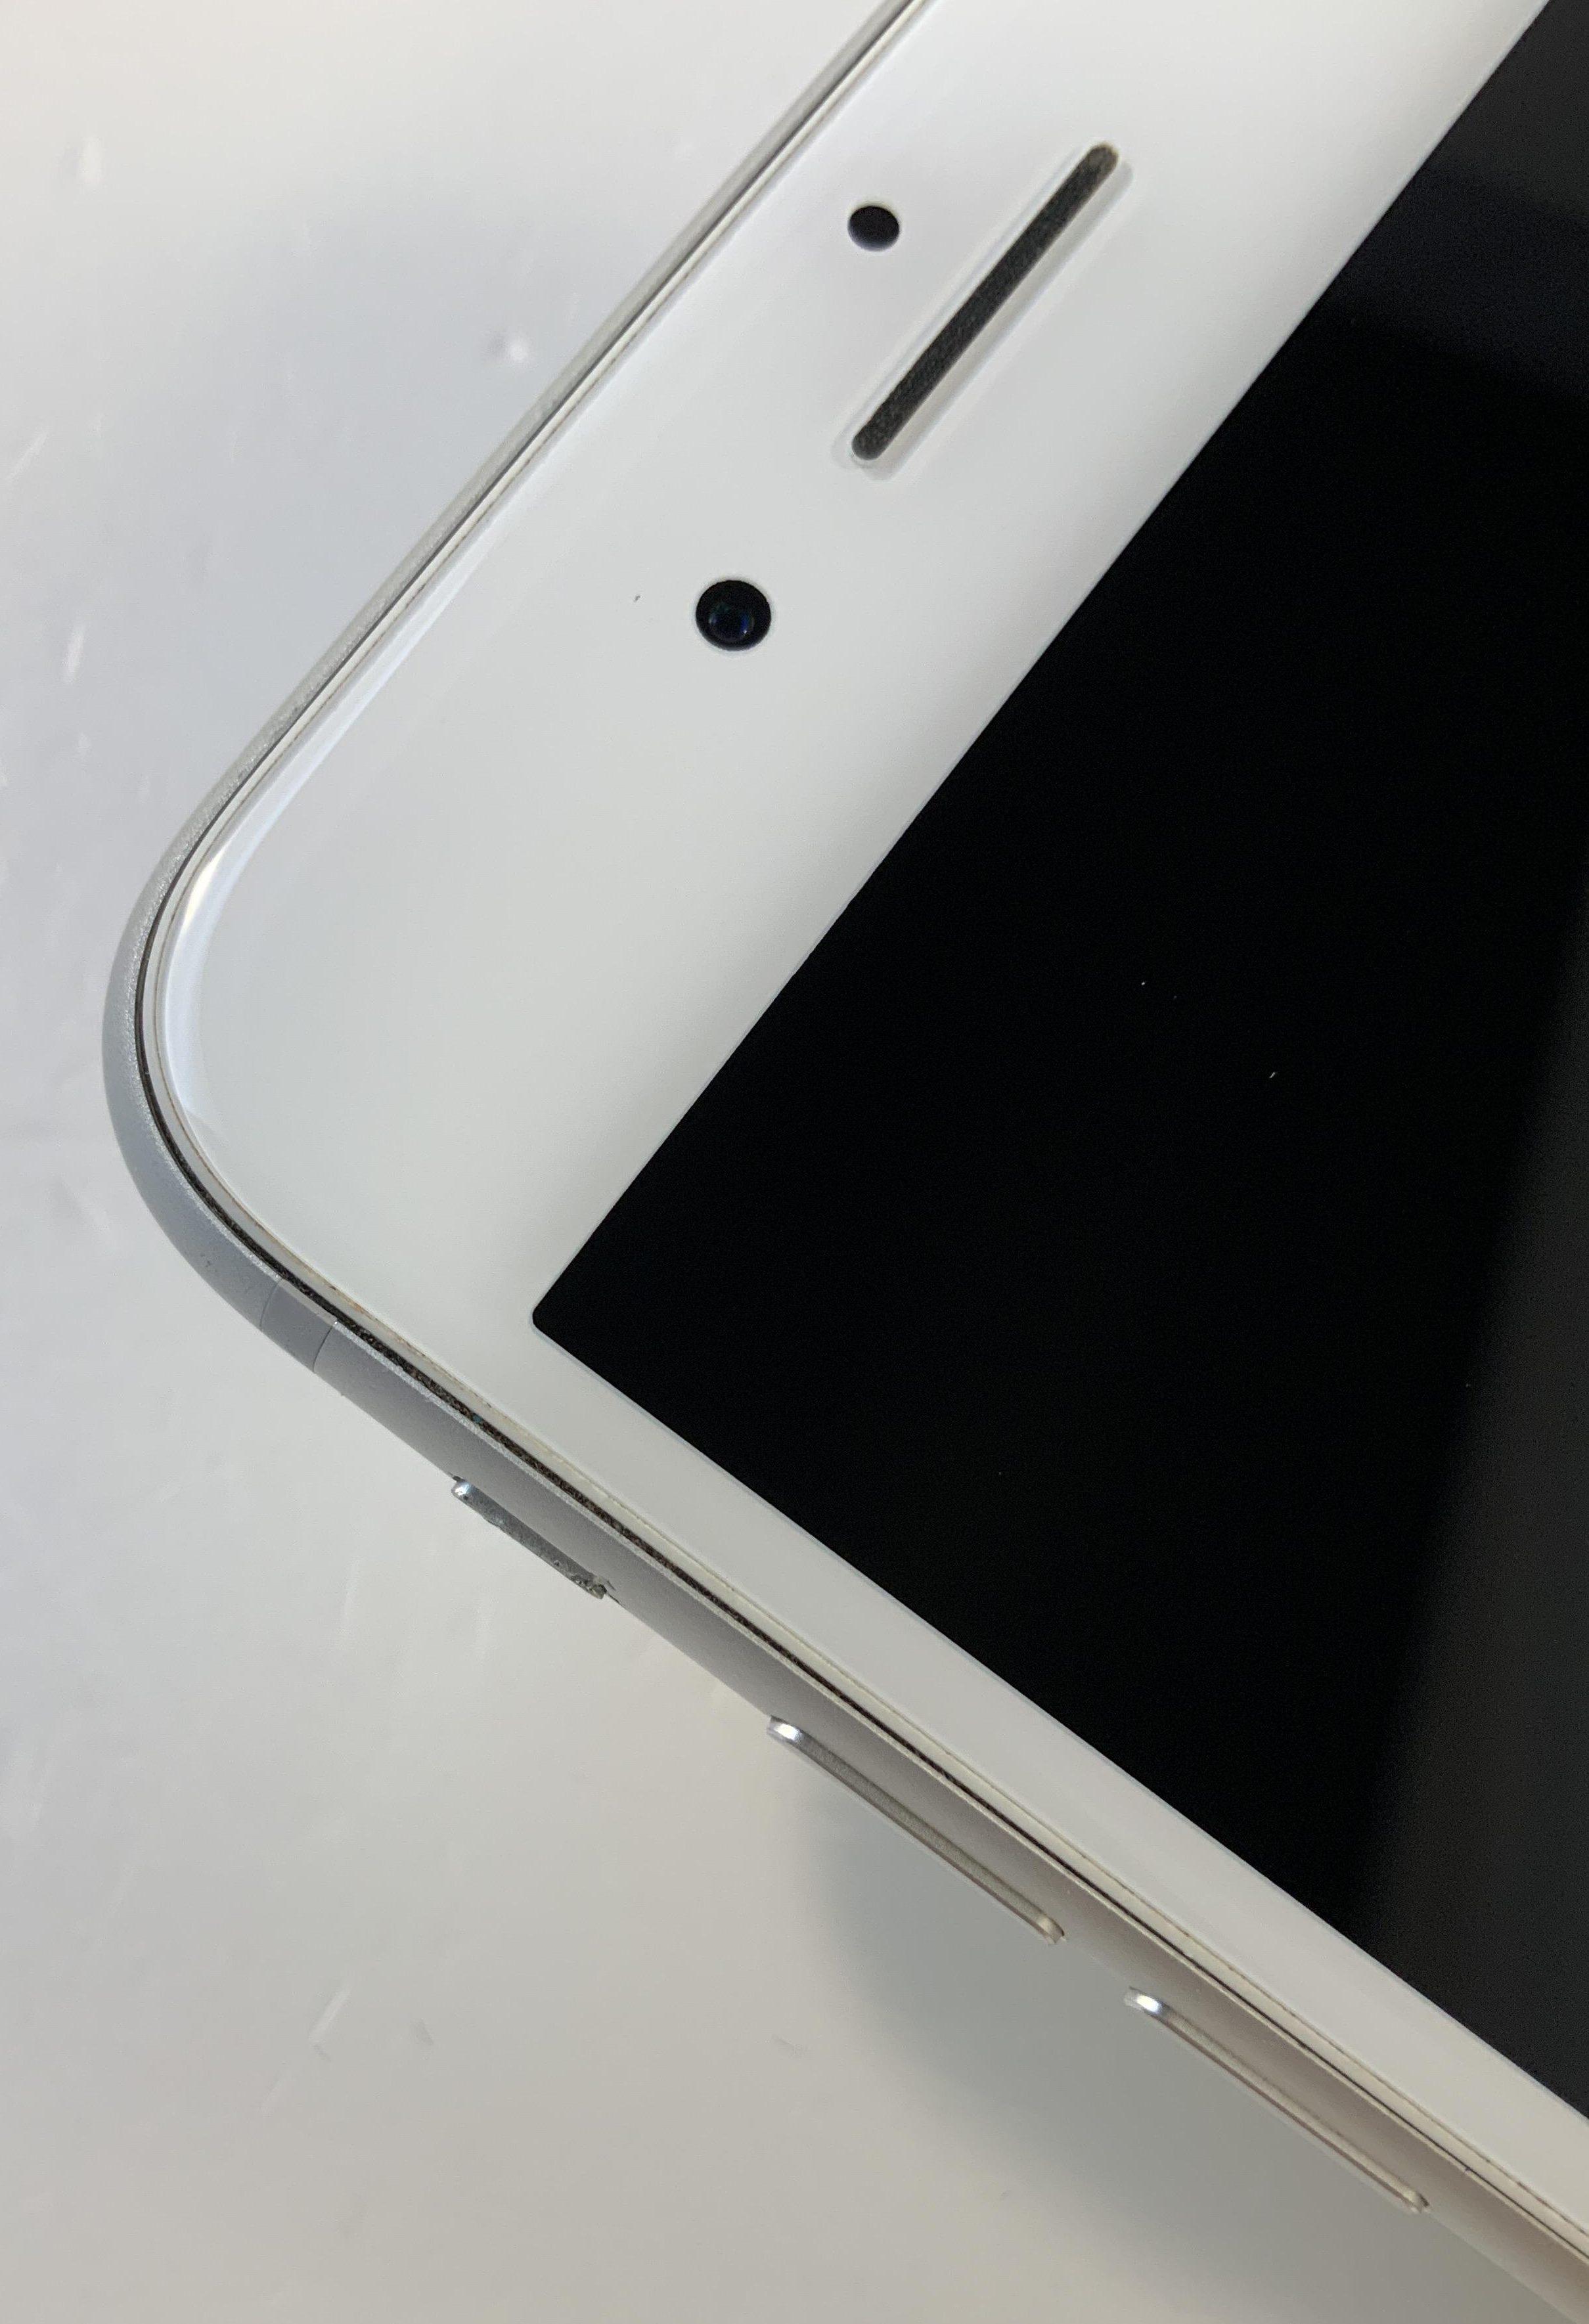 iPhone 8 Plus 256GB, 256GB, Silver, obraz 4